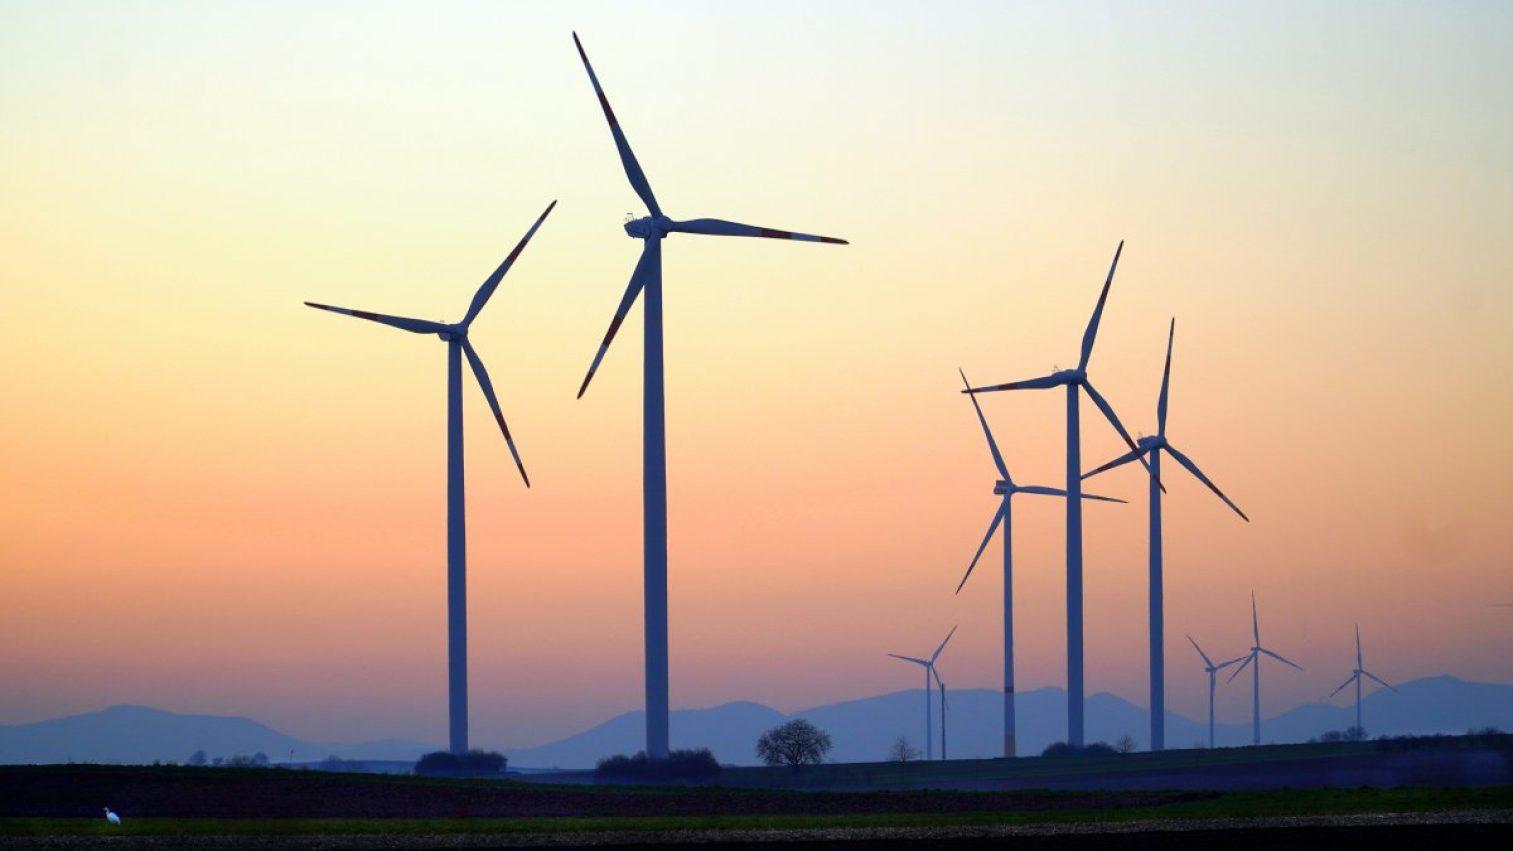 windräder, wind power, wind energy